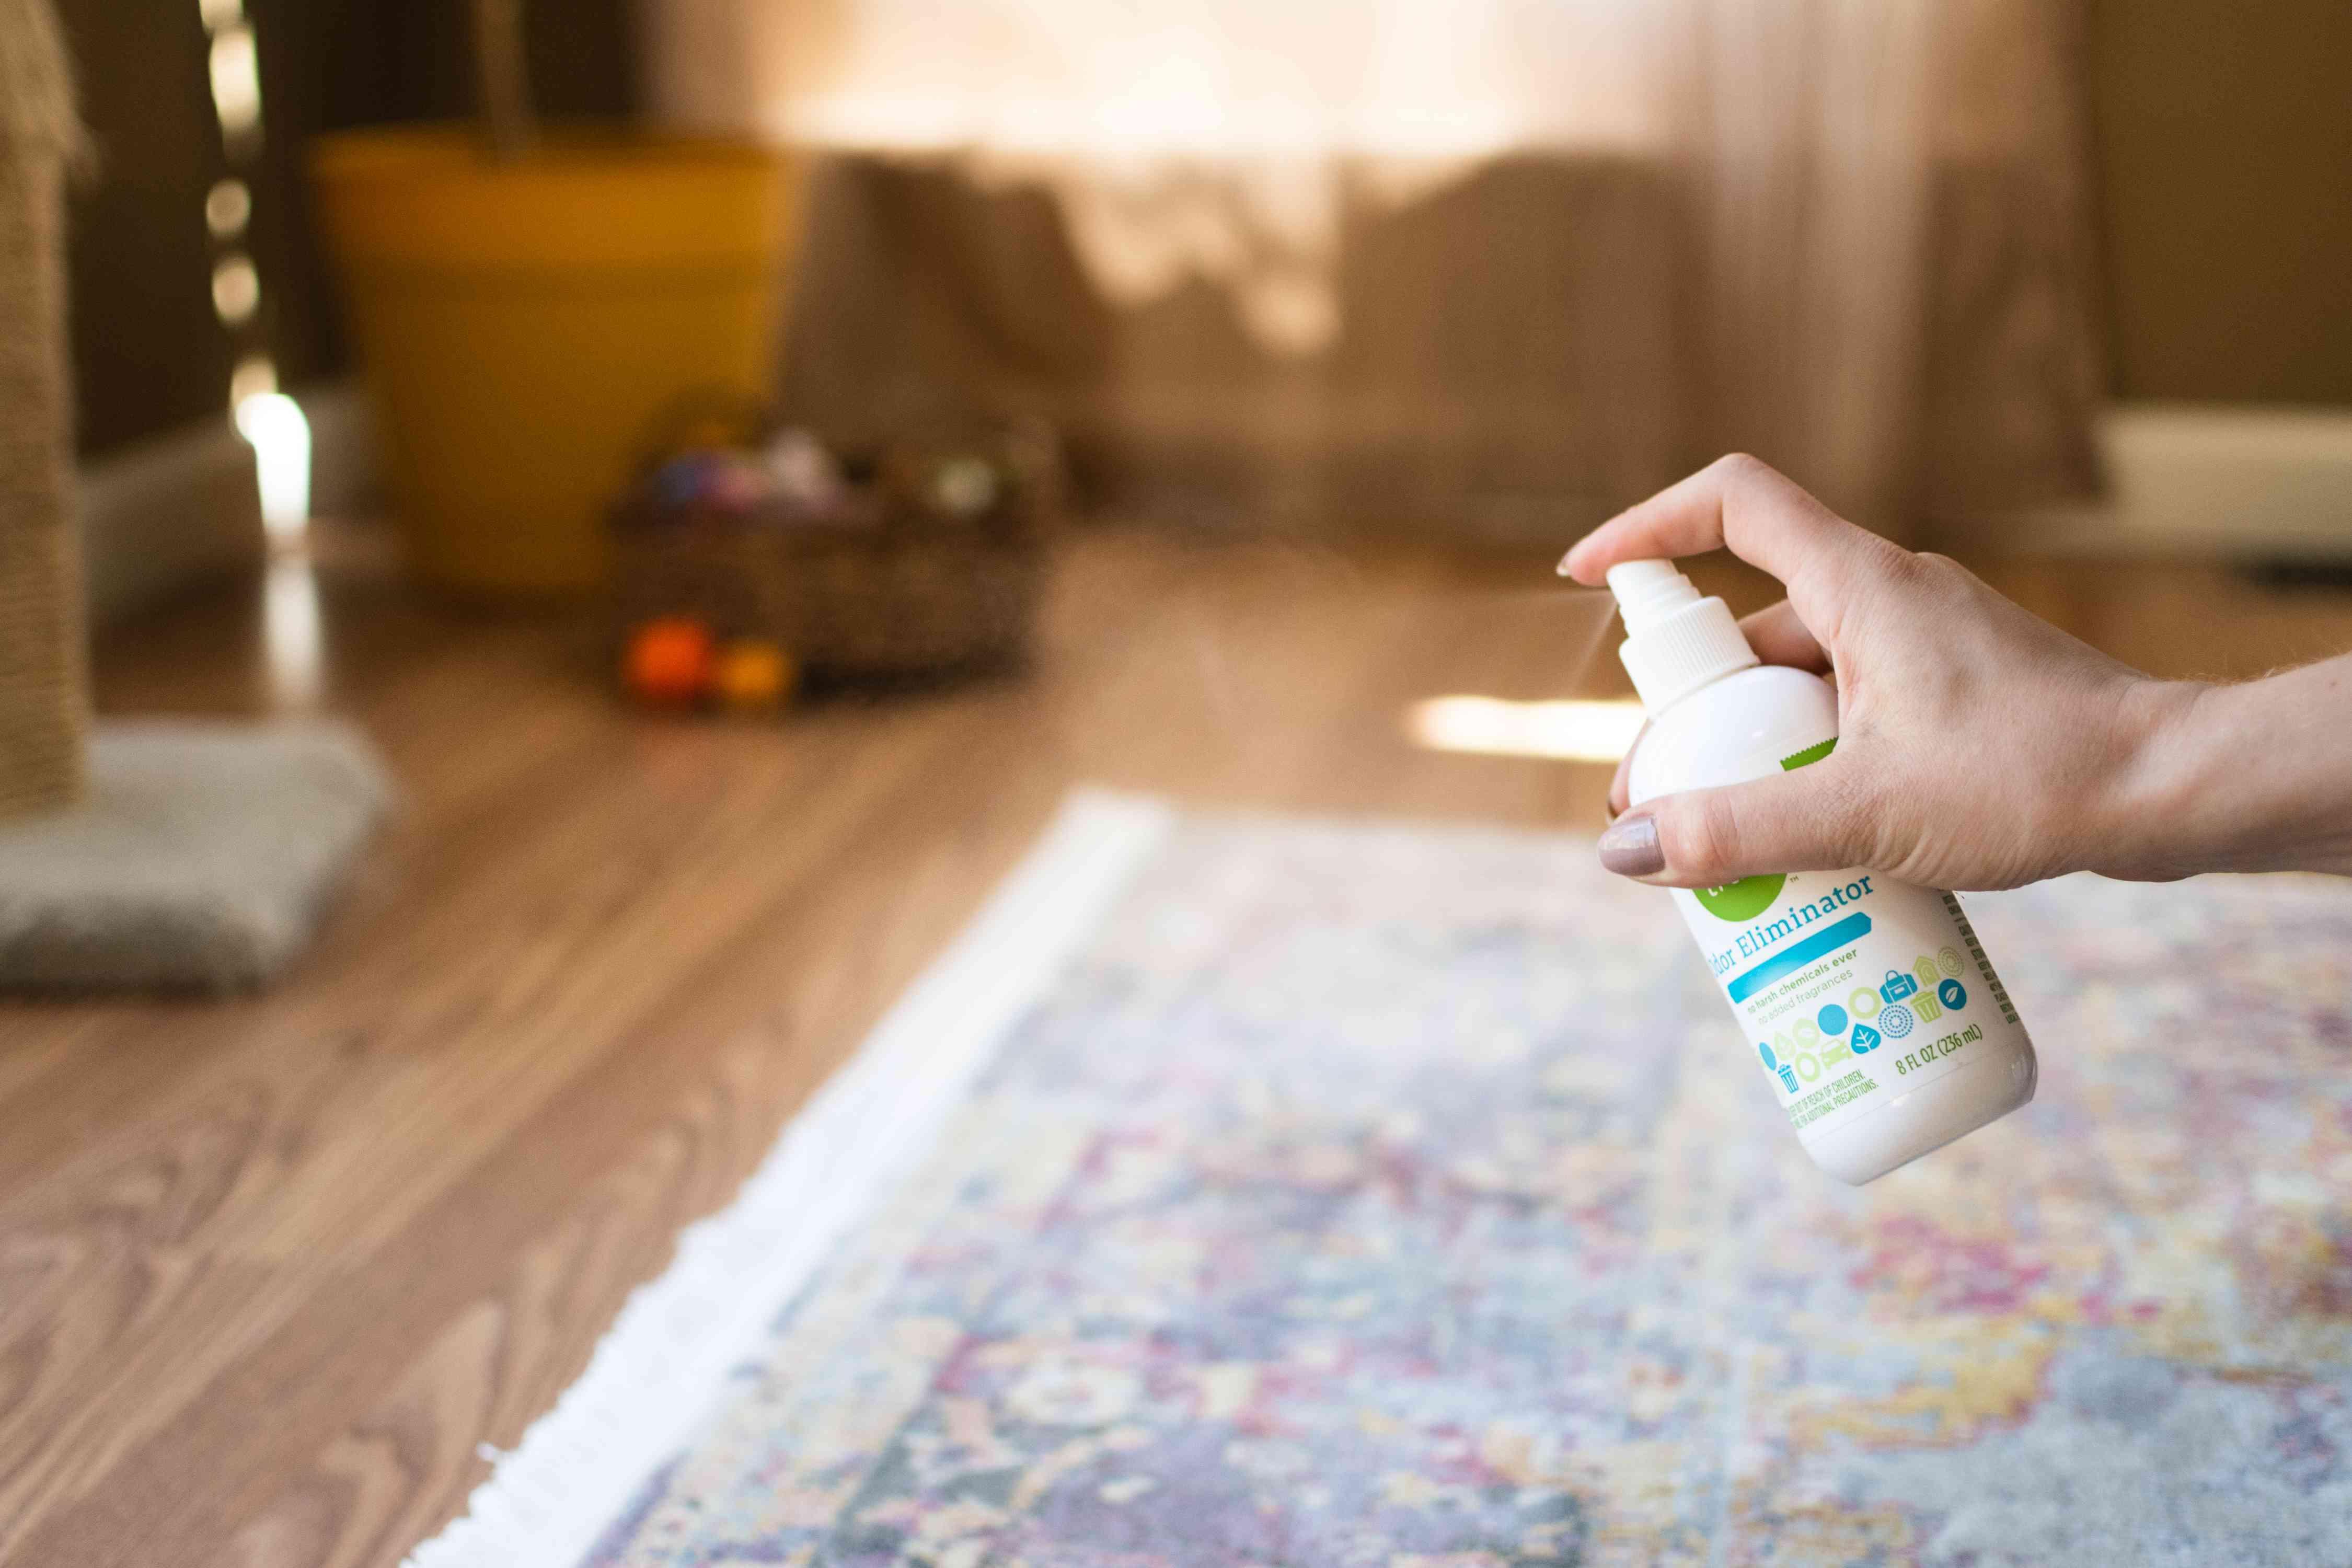 Urine odor remover sprayed on rug with cat pee